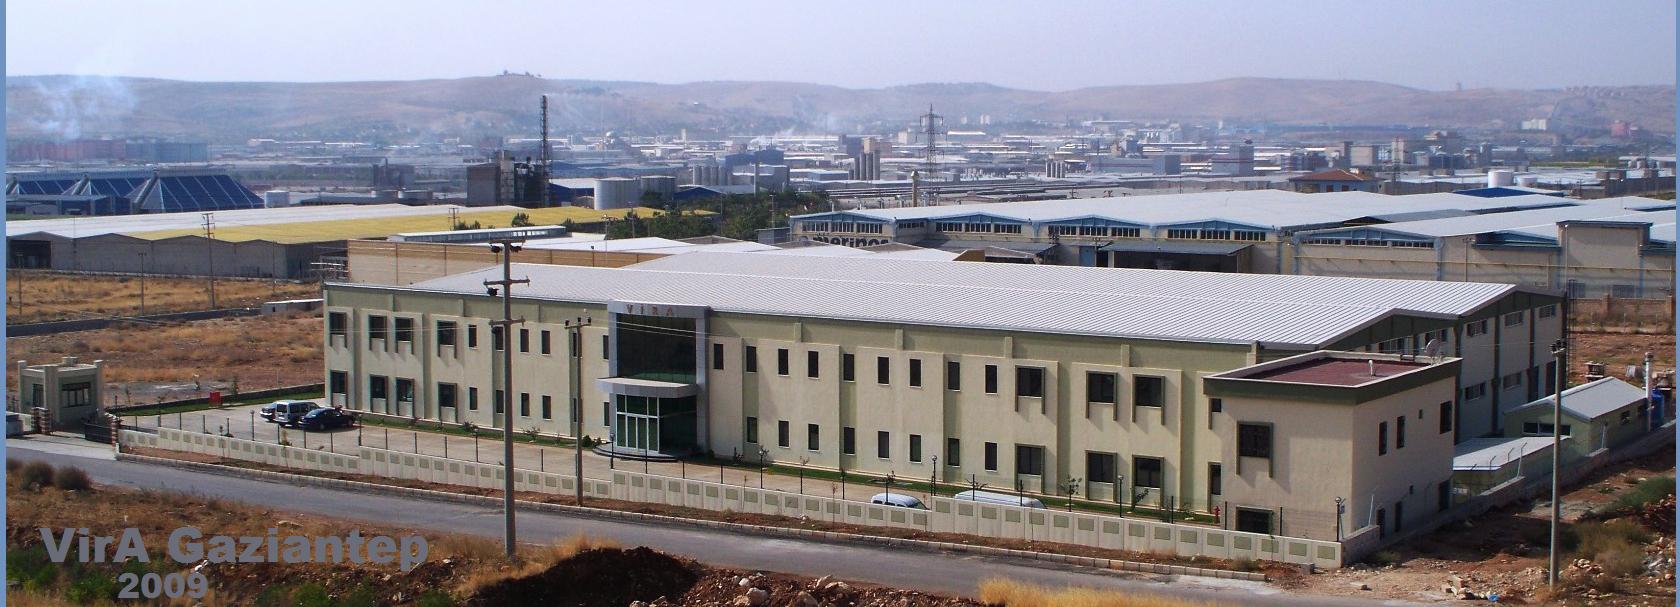 Gaziantep Factory